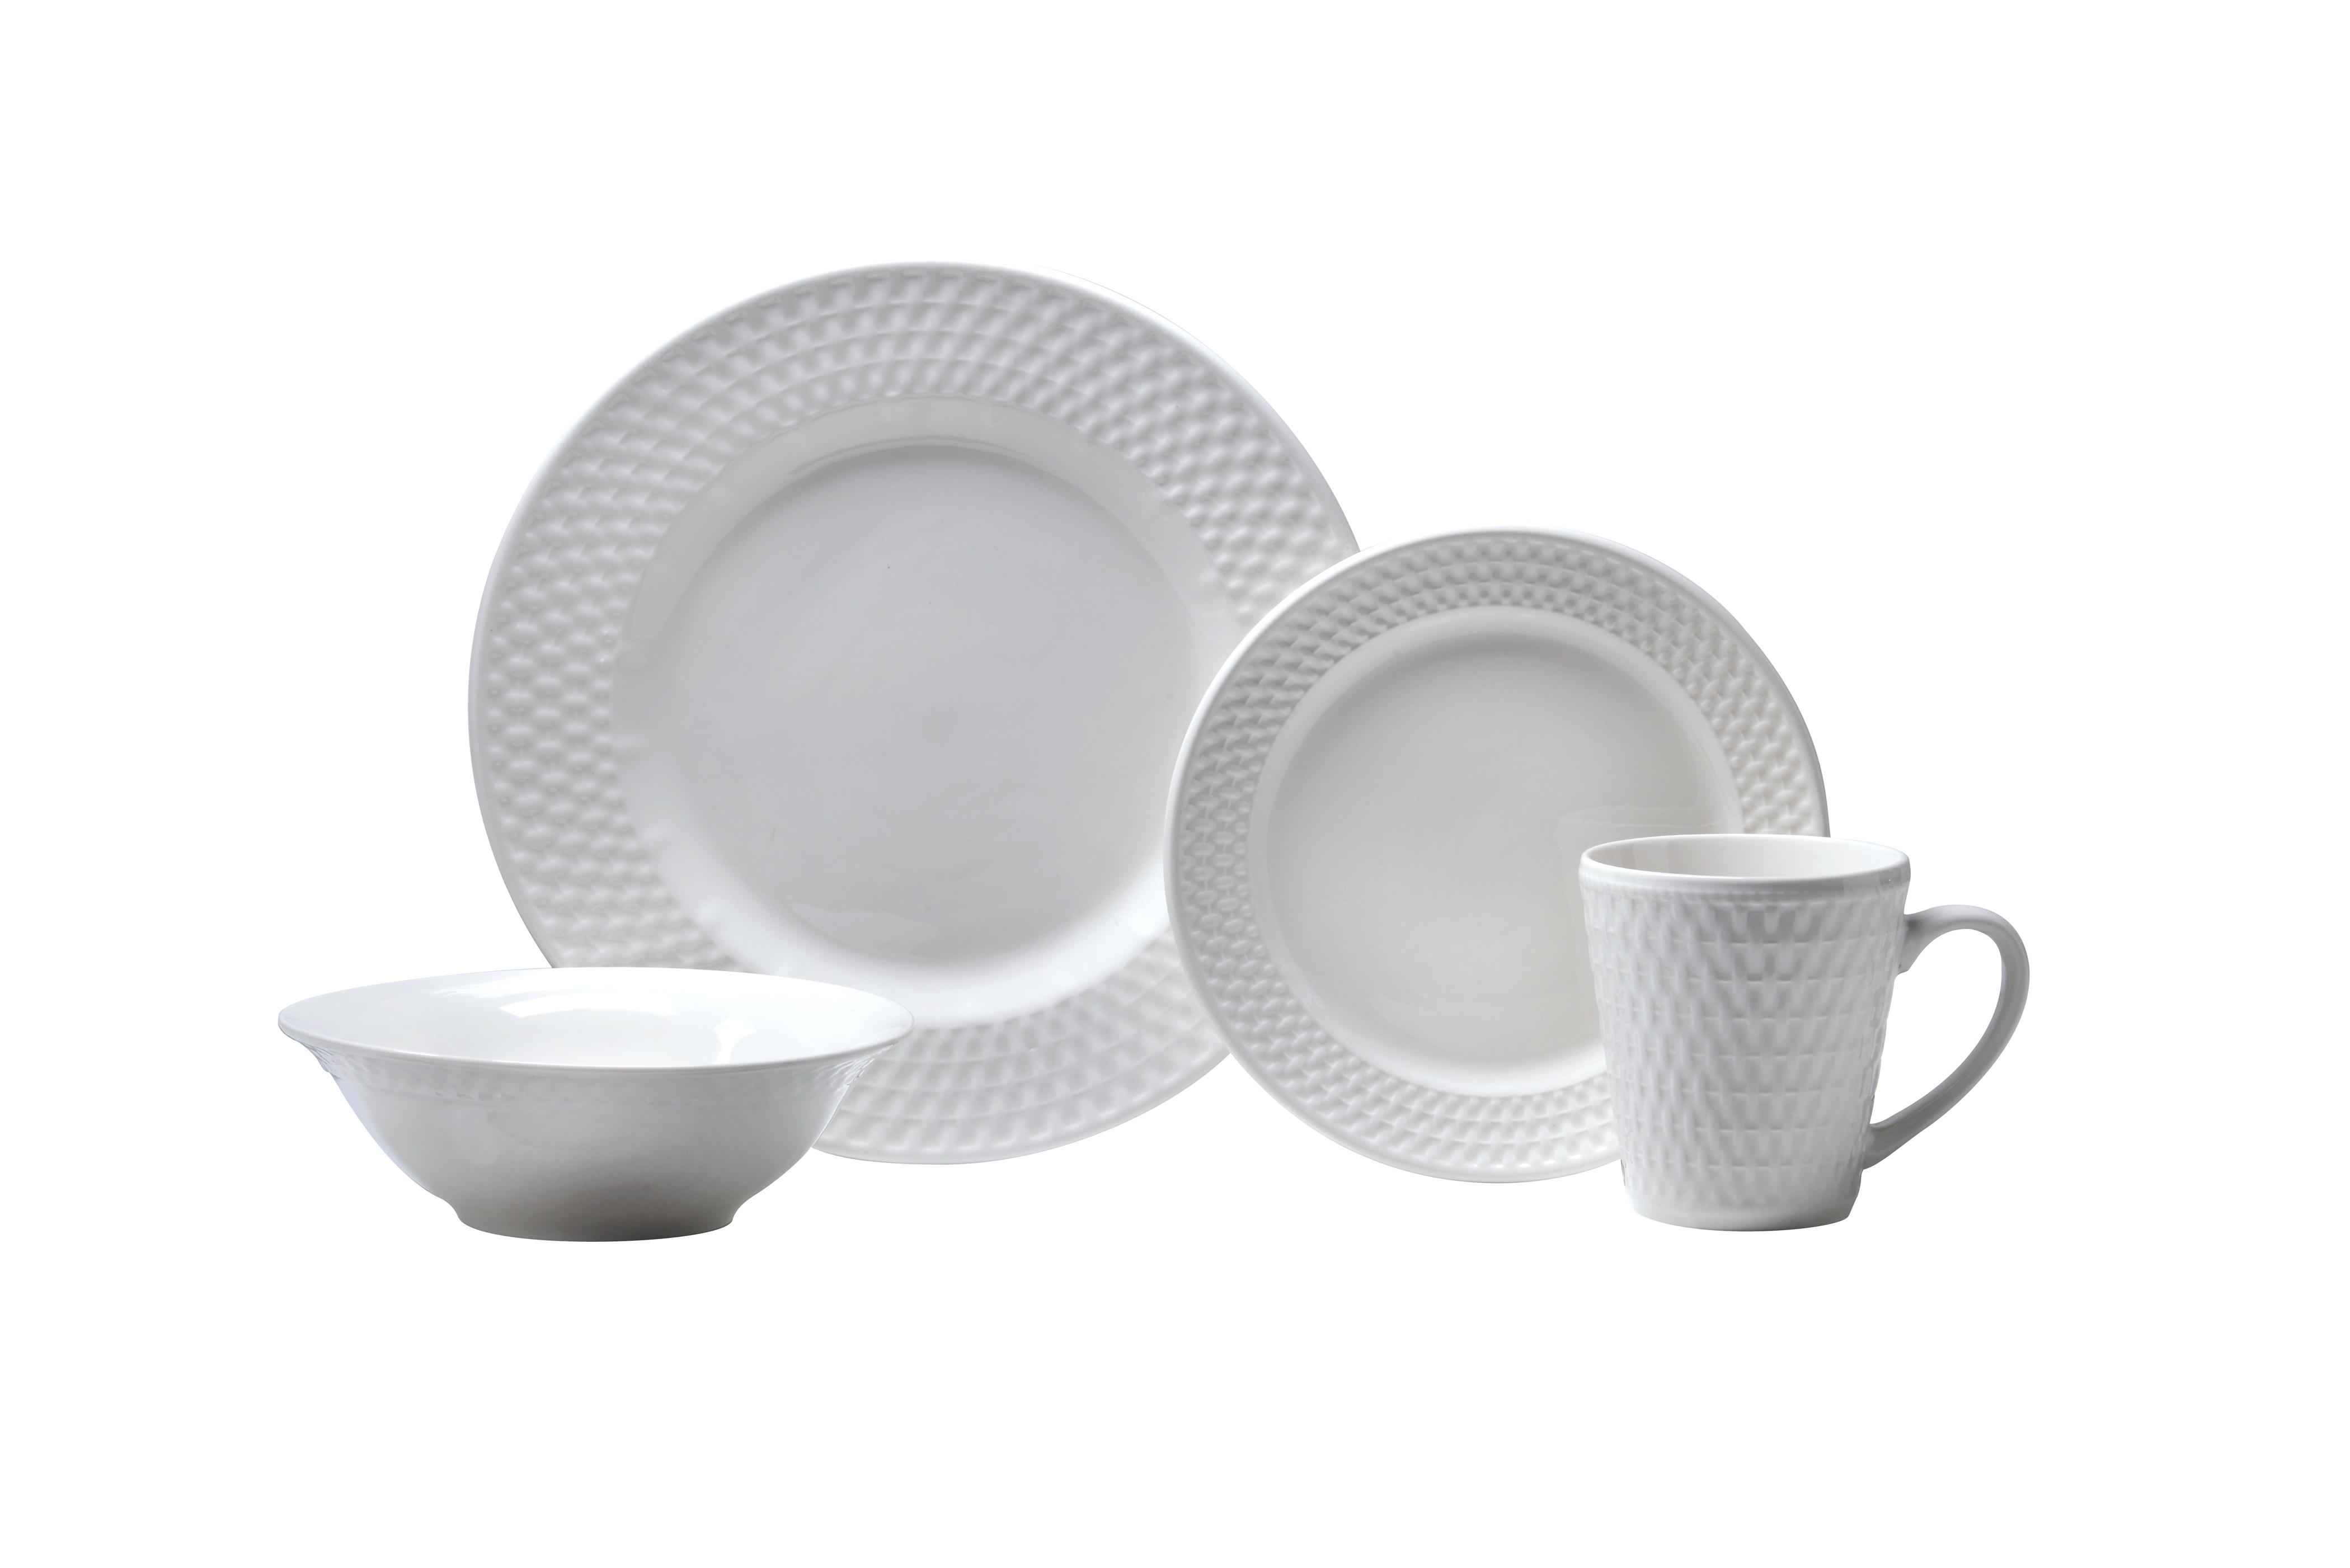 Satin Weave  sc 1 st  Kitchenware News & Oneida Dinnerware Caught In All-White after Labor Day | Kitchenware ...